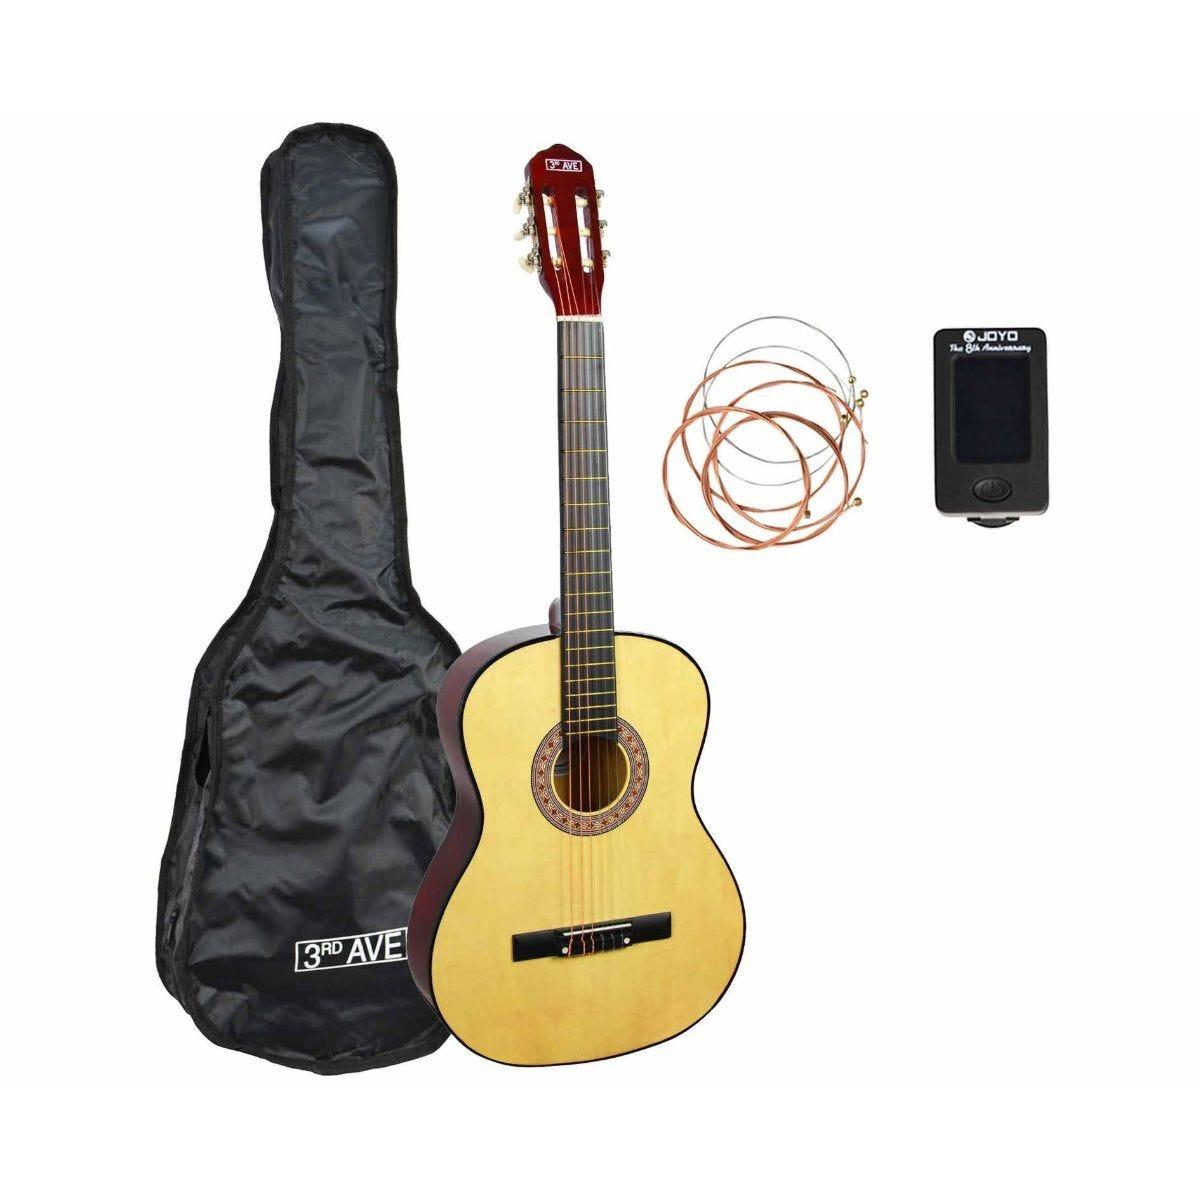 3rd Avenue Full Size Beginner Classical Guitar Pack Natural